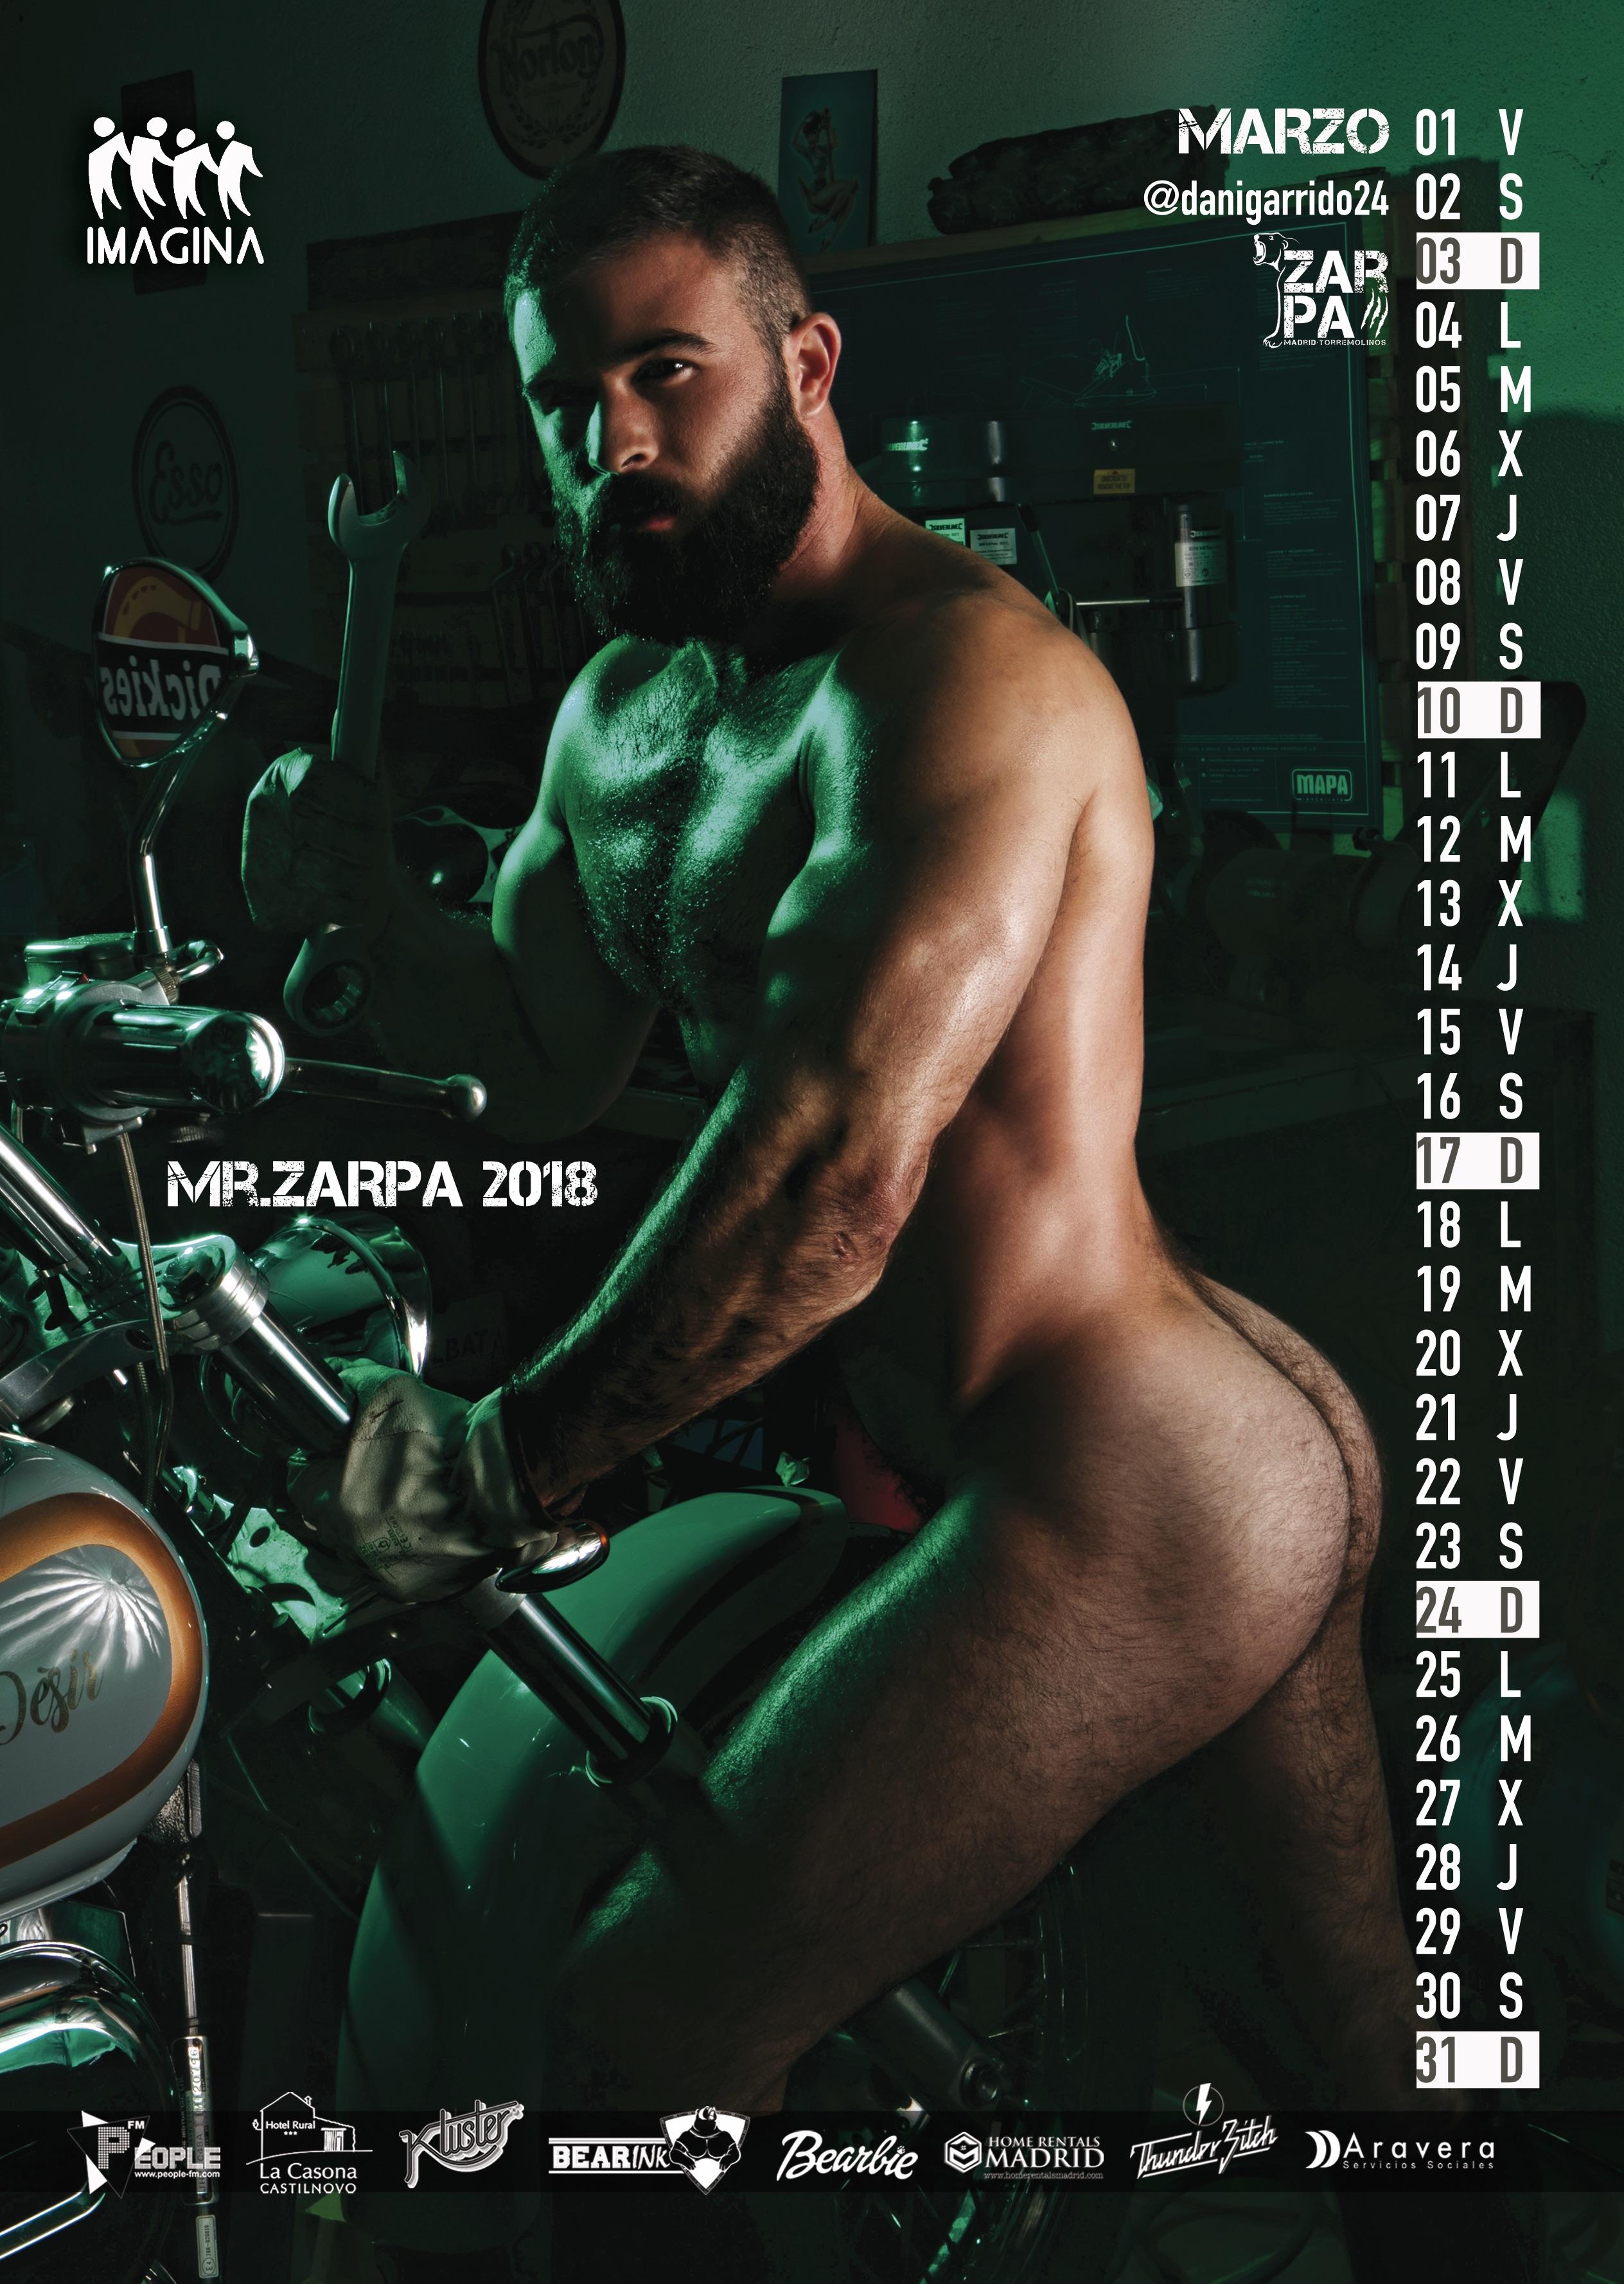 calendario zarpa Madrid